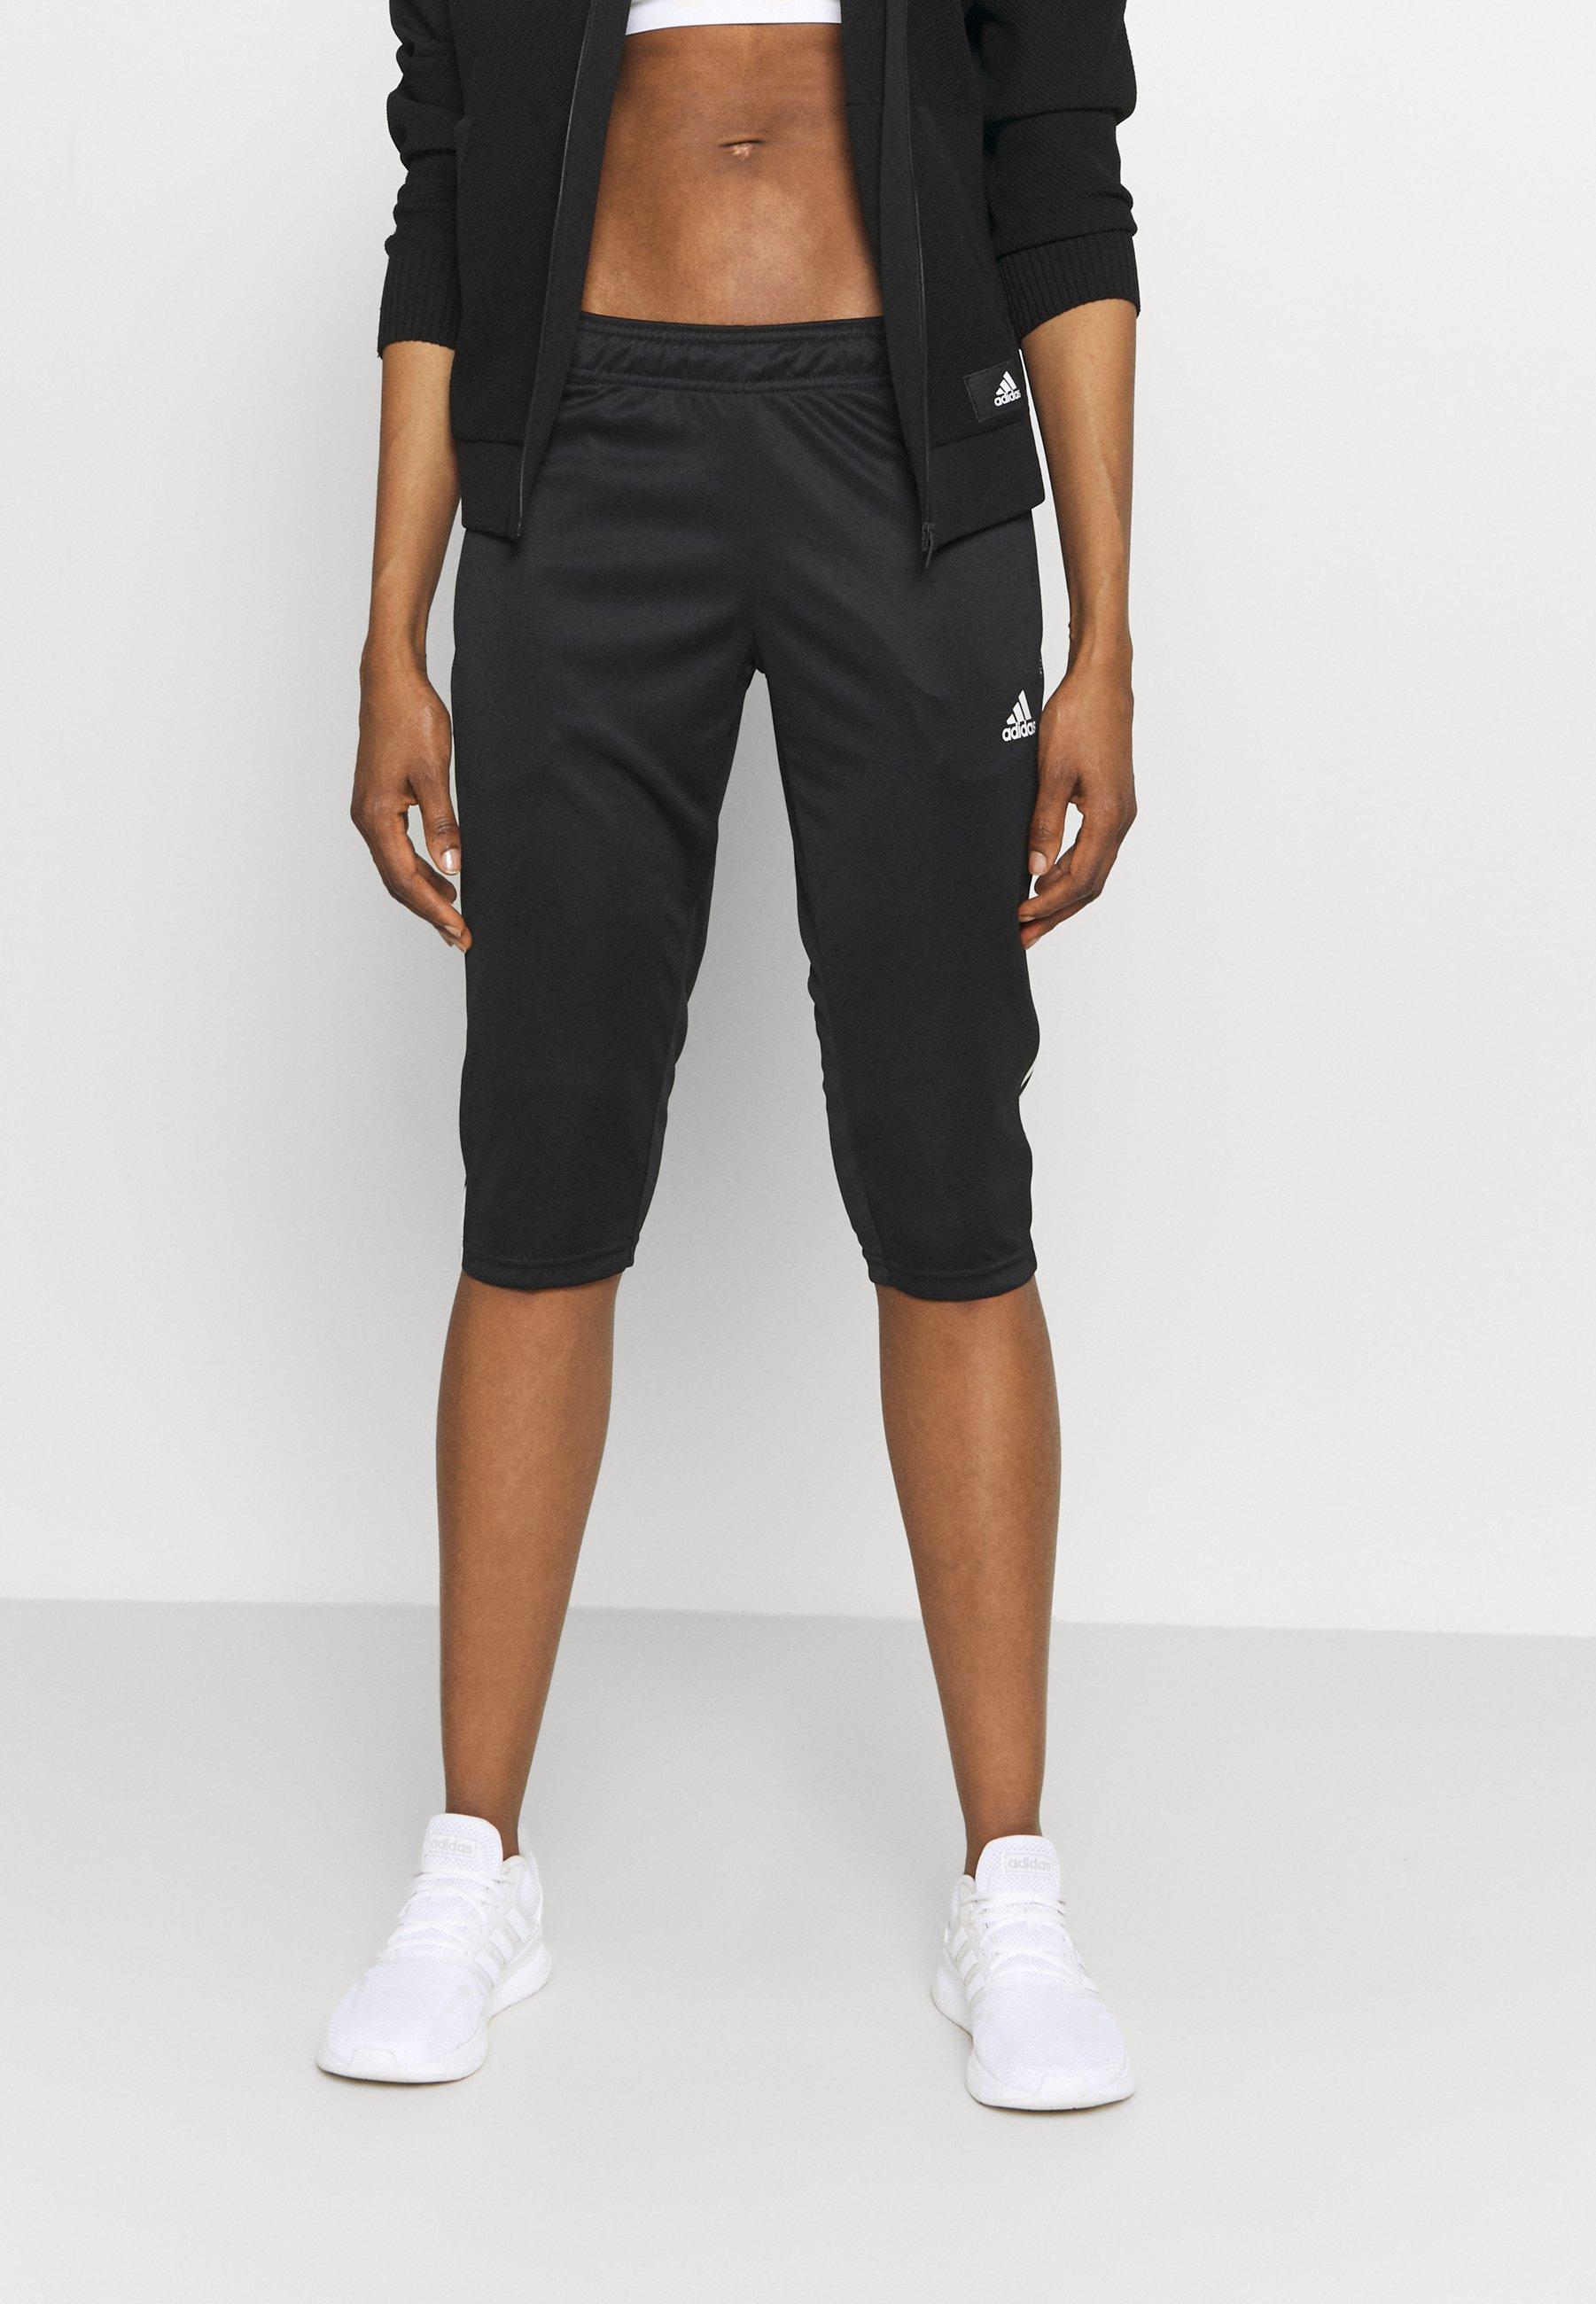 Women TIRO 21 - 3/4 sports trousers